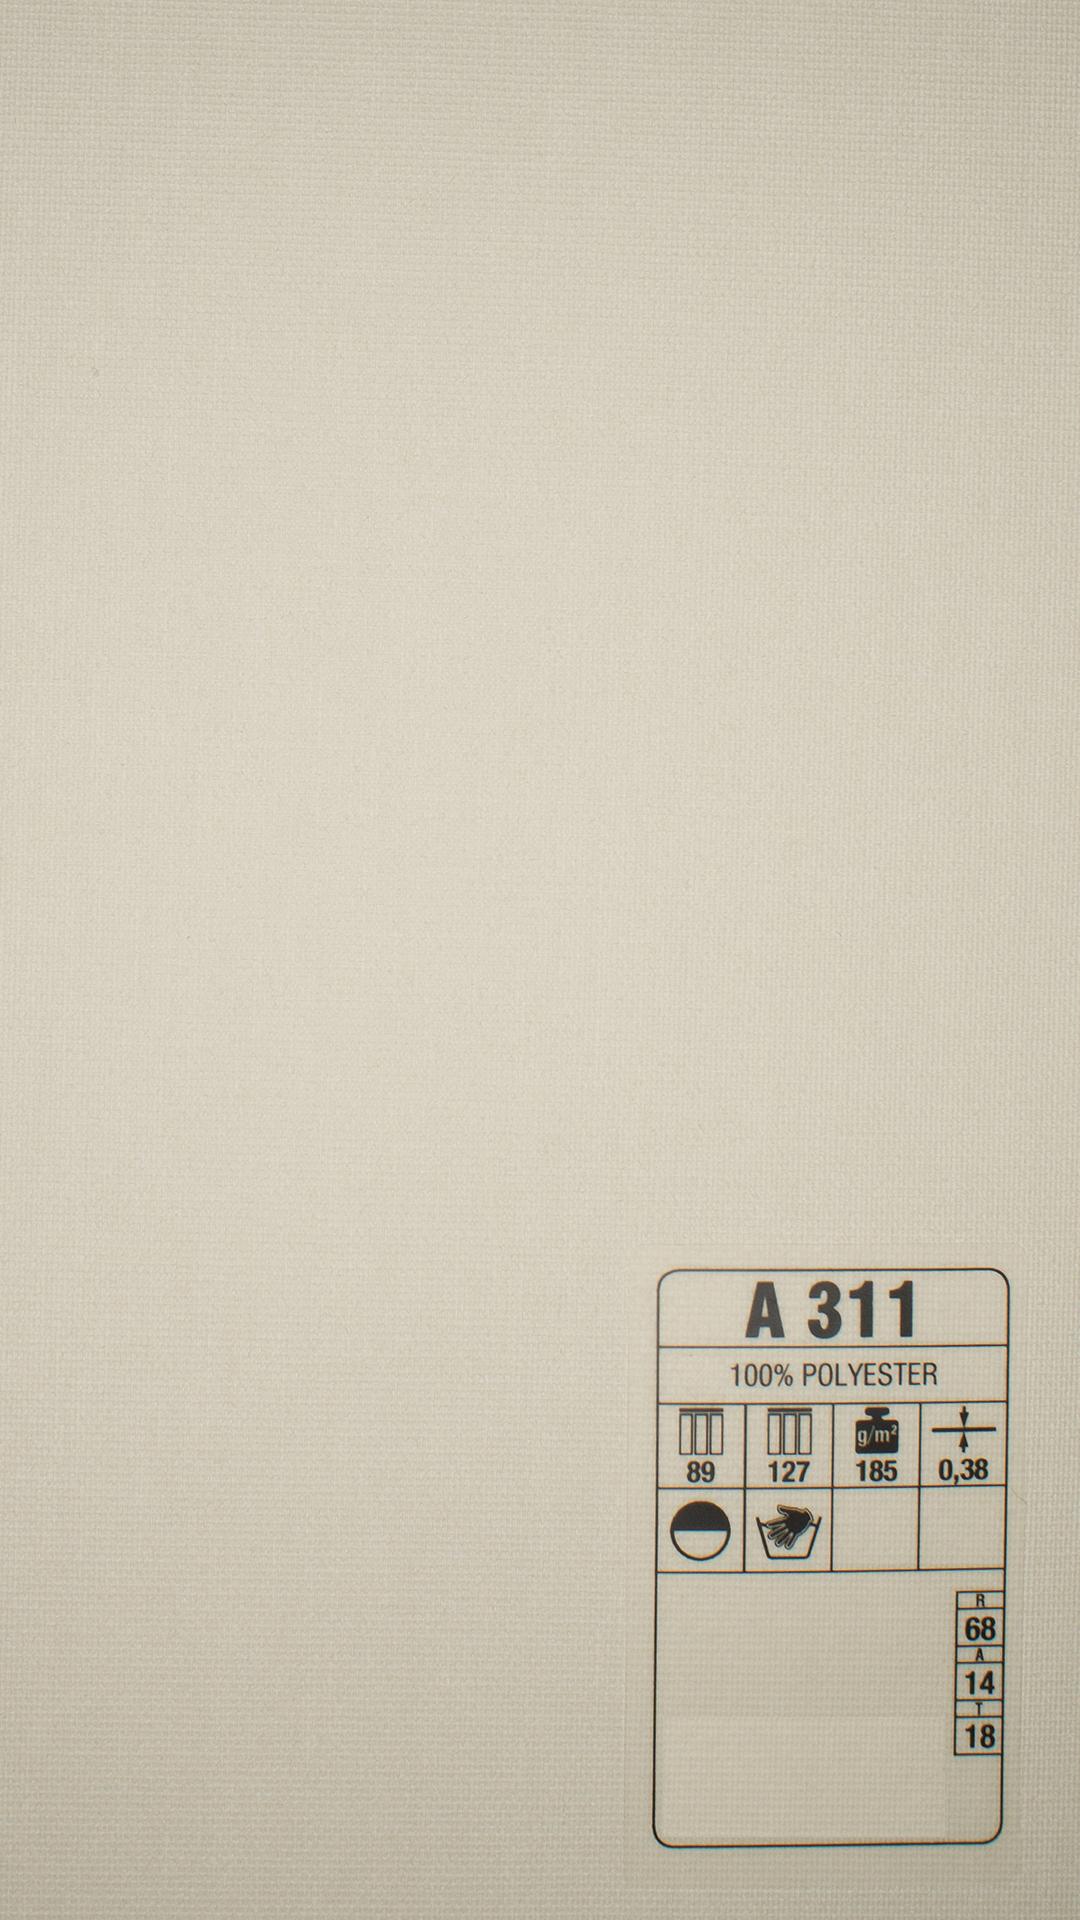 A 311